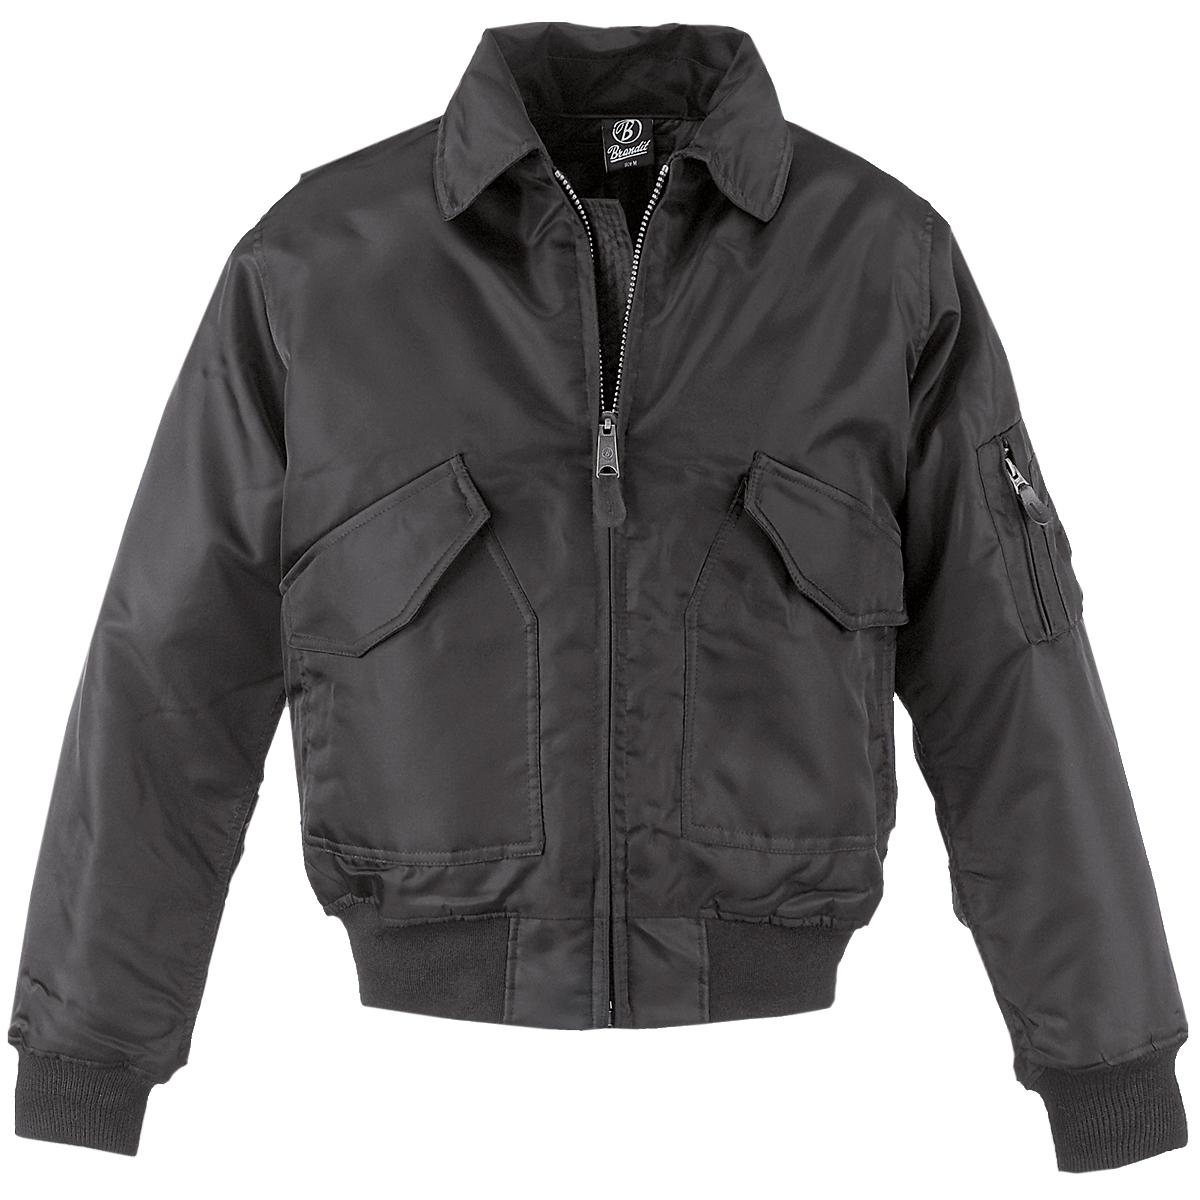 Security Jacket Cordura Shoke Tactical